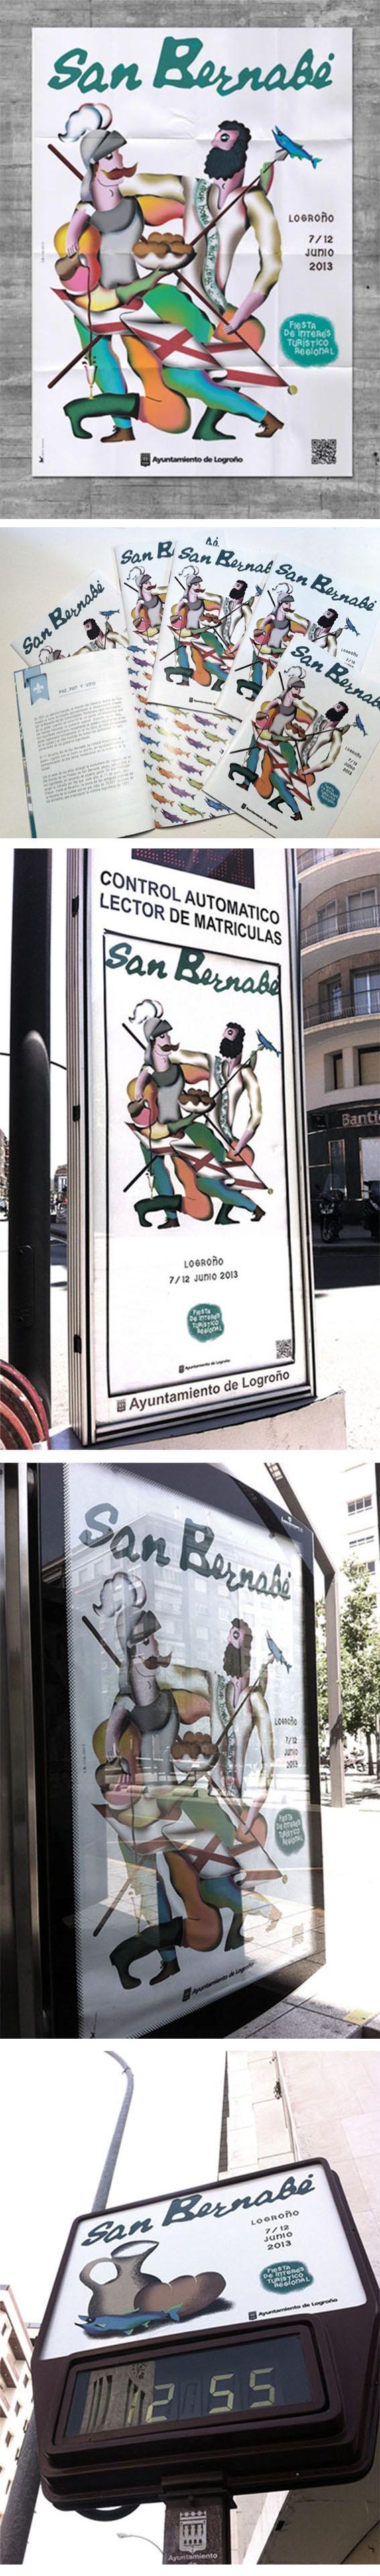 San Bernabé Identity Logroño 2013 Frän Alðnssön